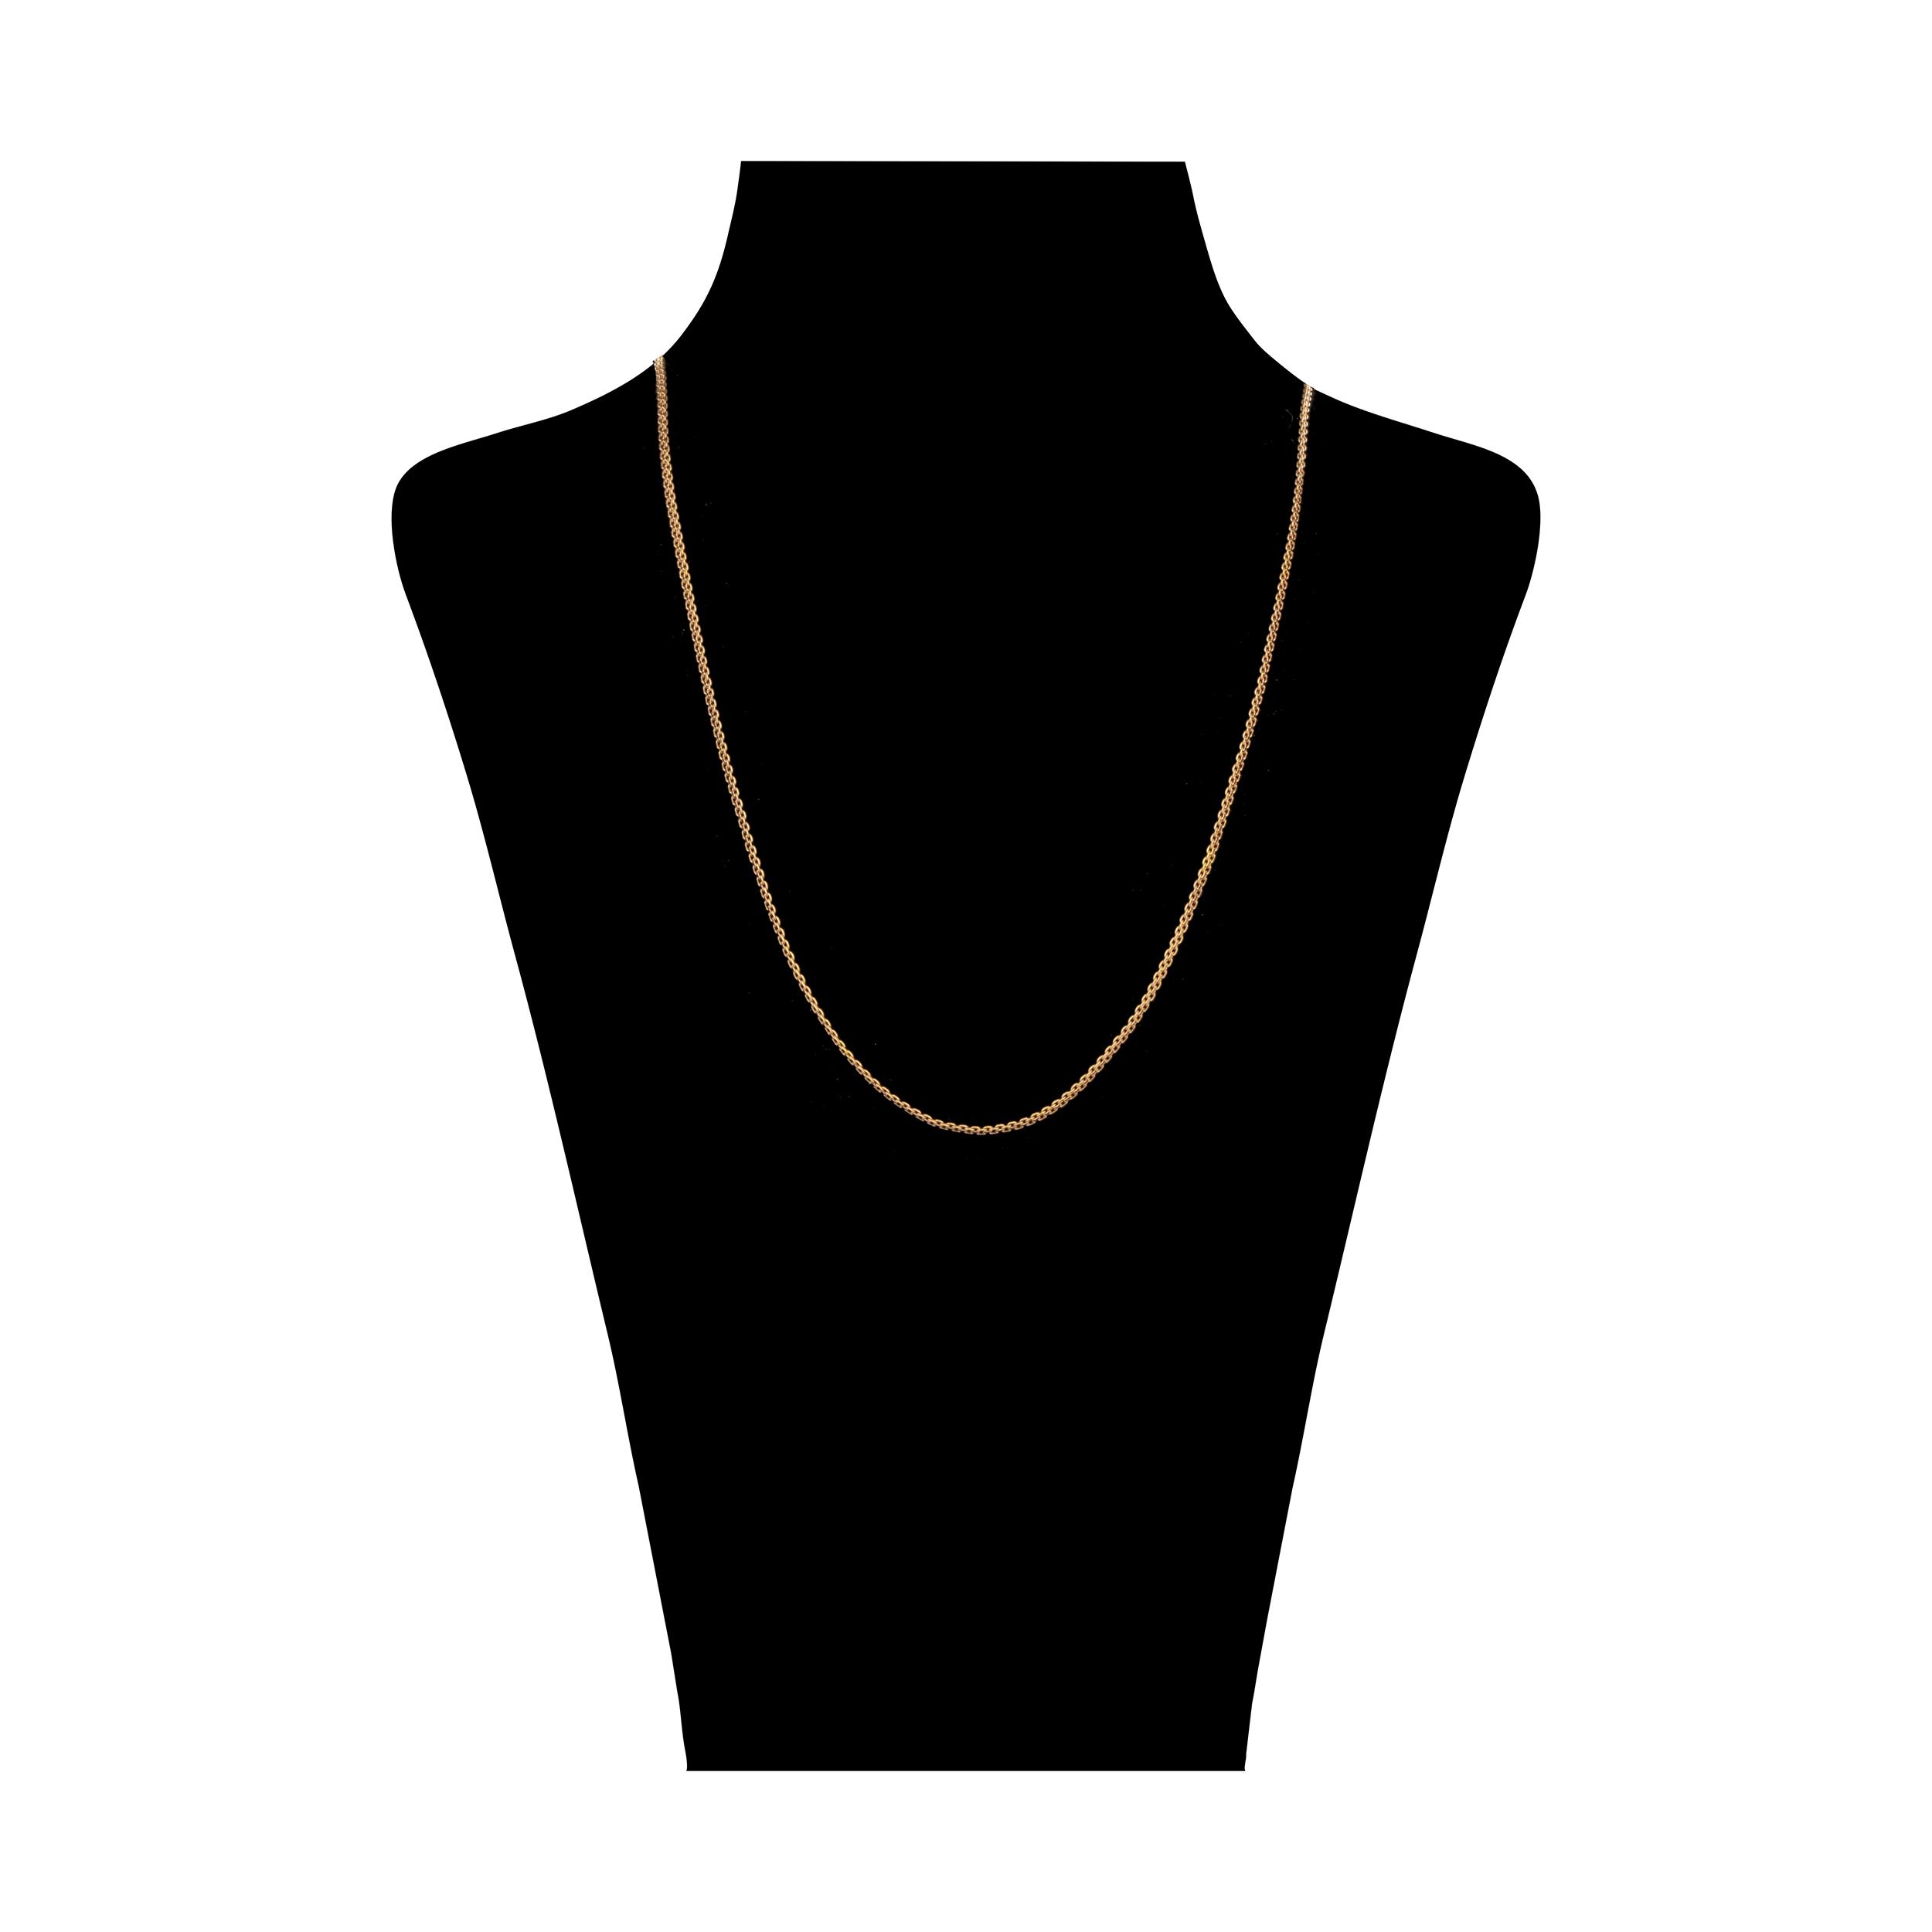 زنجیر طلا 18 عیار زنانه آلند کد TZ134